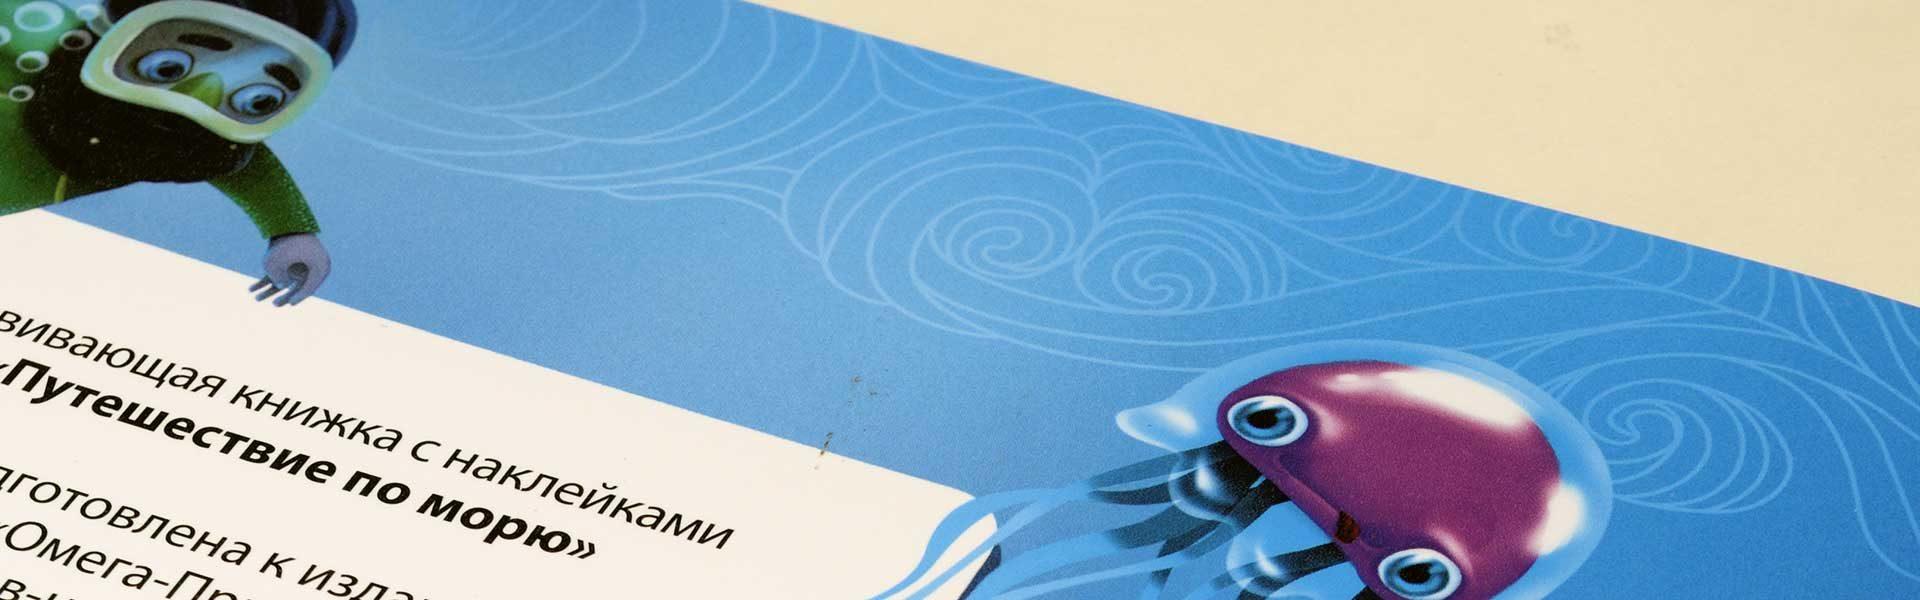 Путешествие по морю книжка с наклейками